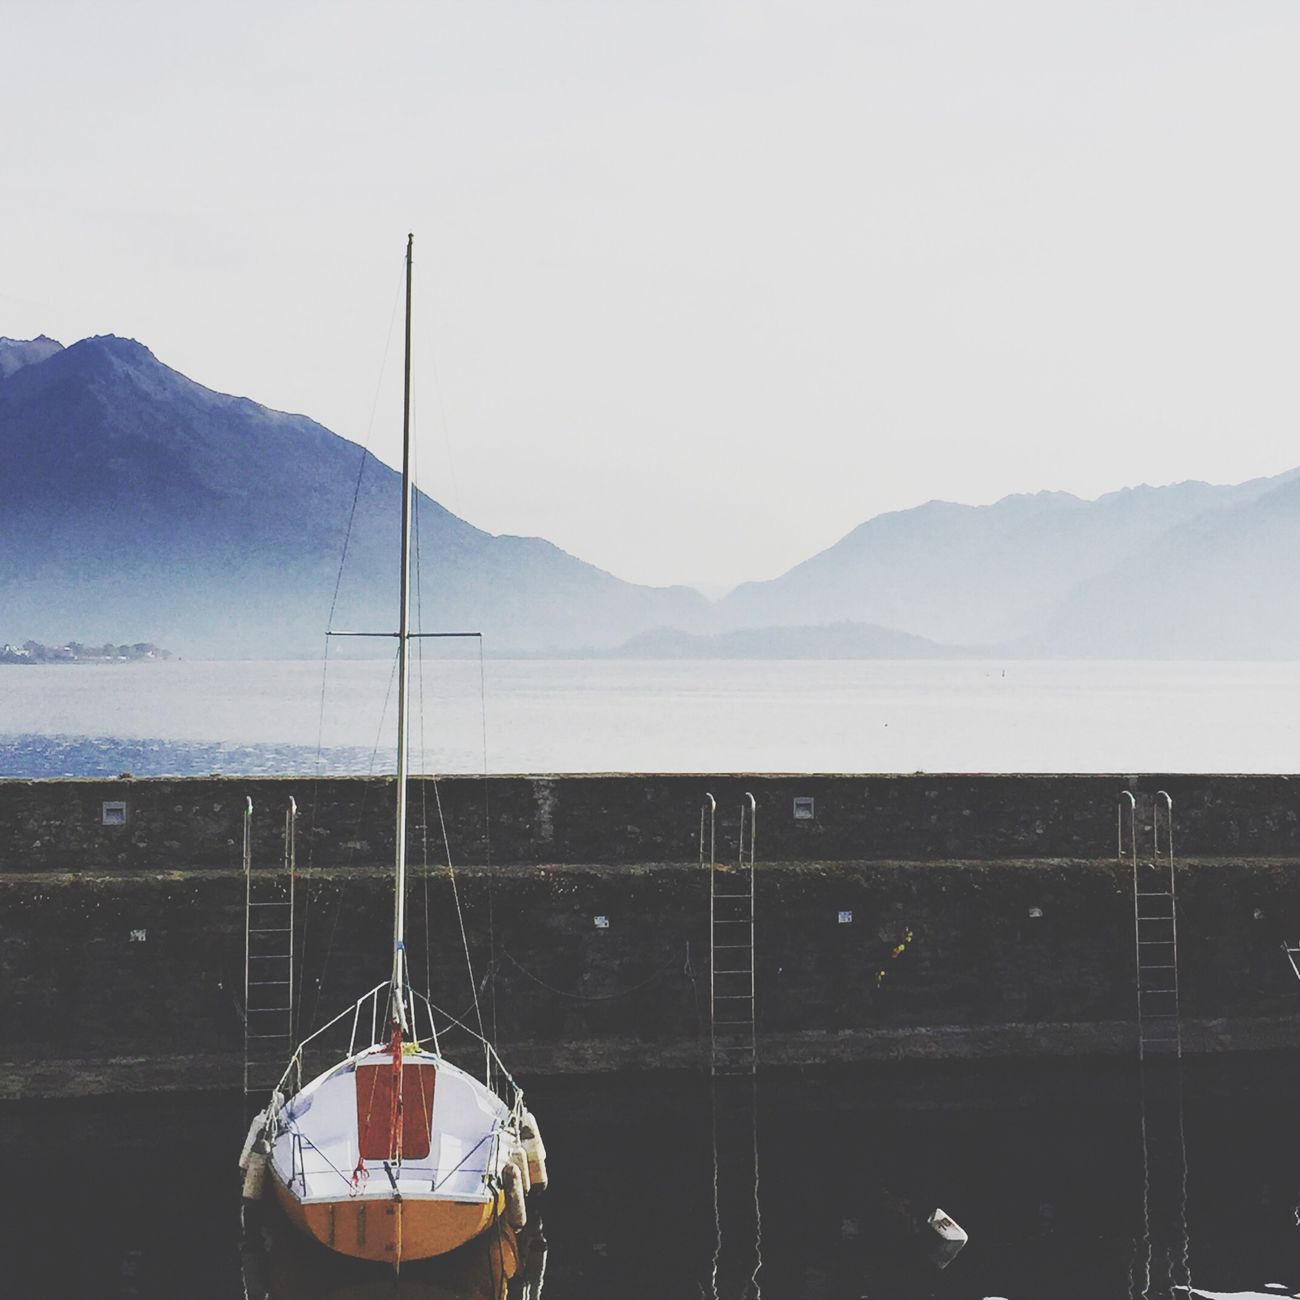 ⛵️ Vscophile Vscogrid VSCO Cam VSCO Vscogood Lakecomo Como View From My Point Of View Fog Mountains Feel The Journey